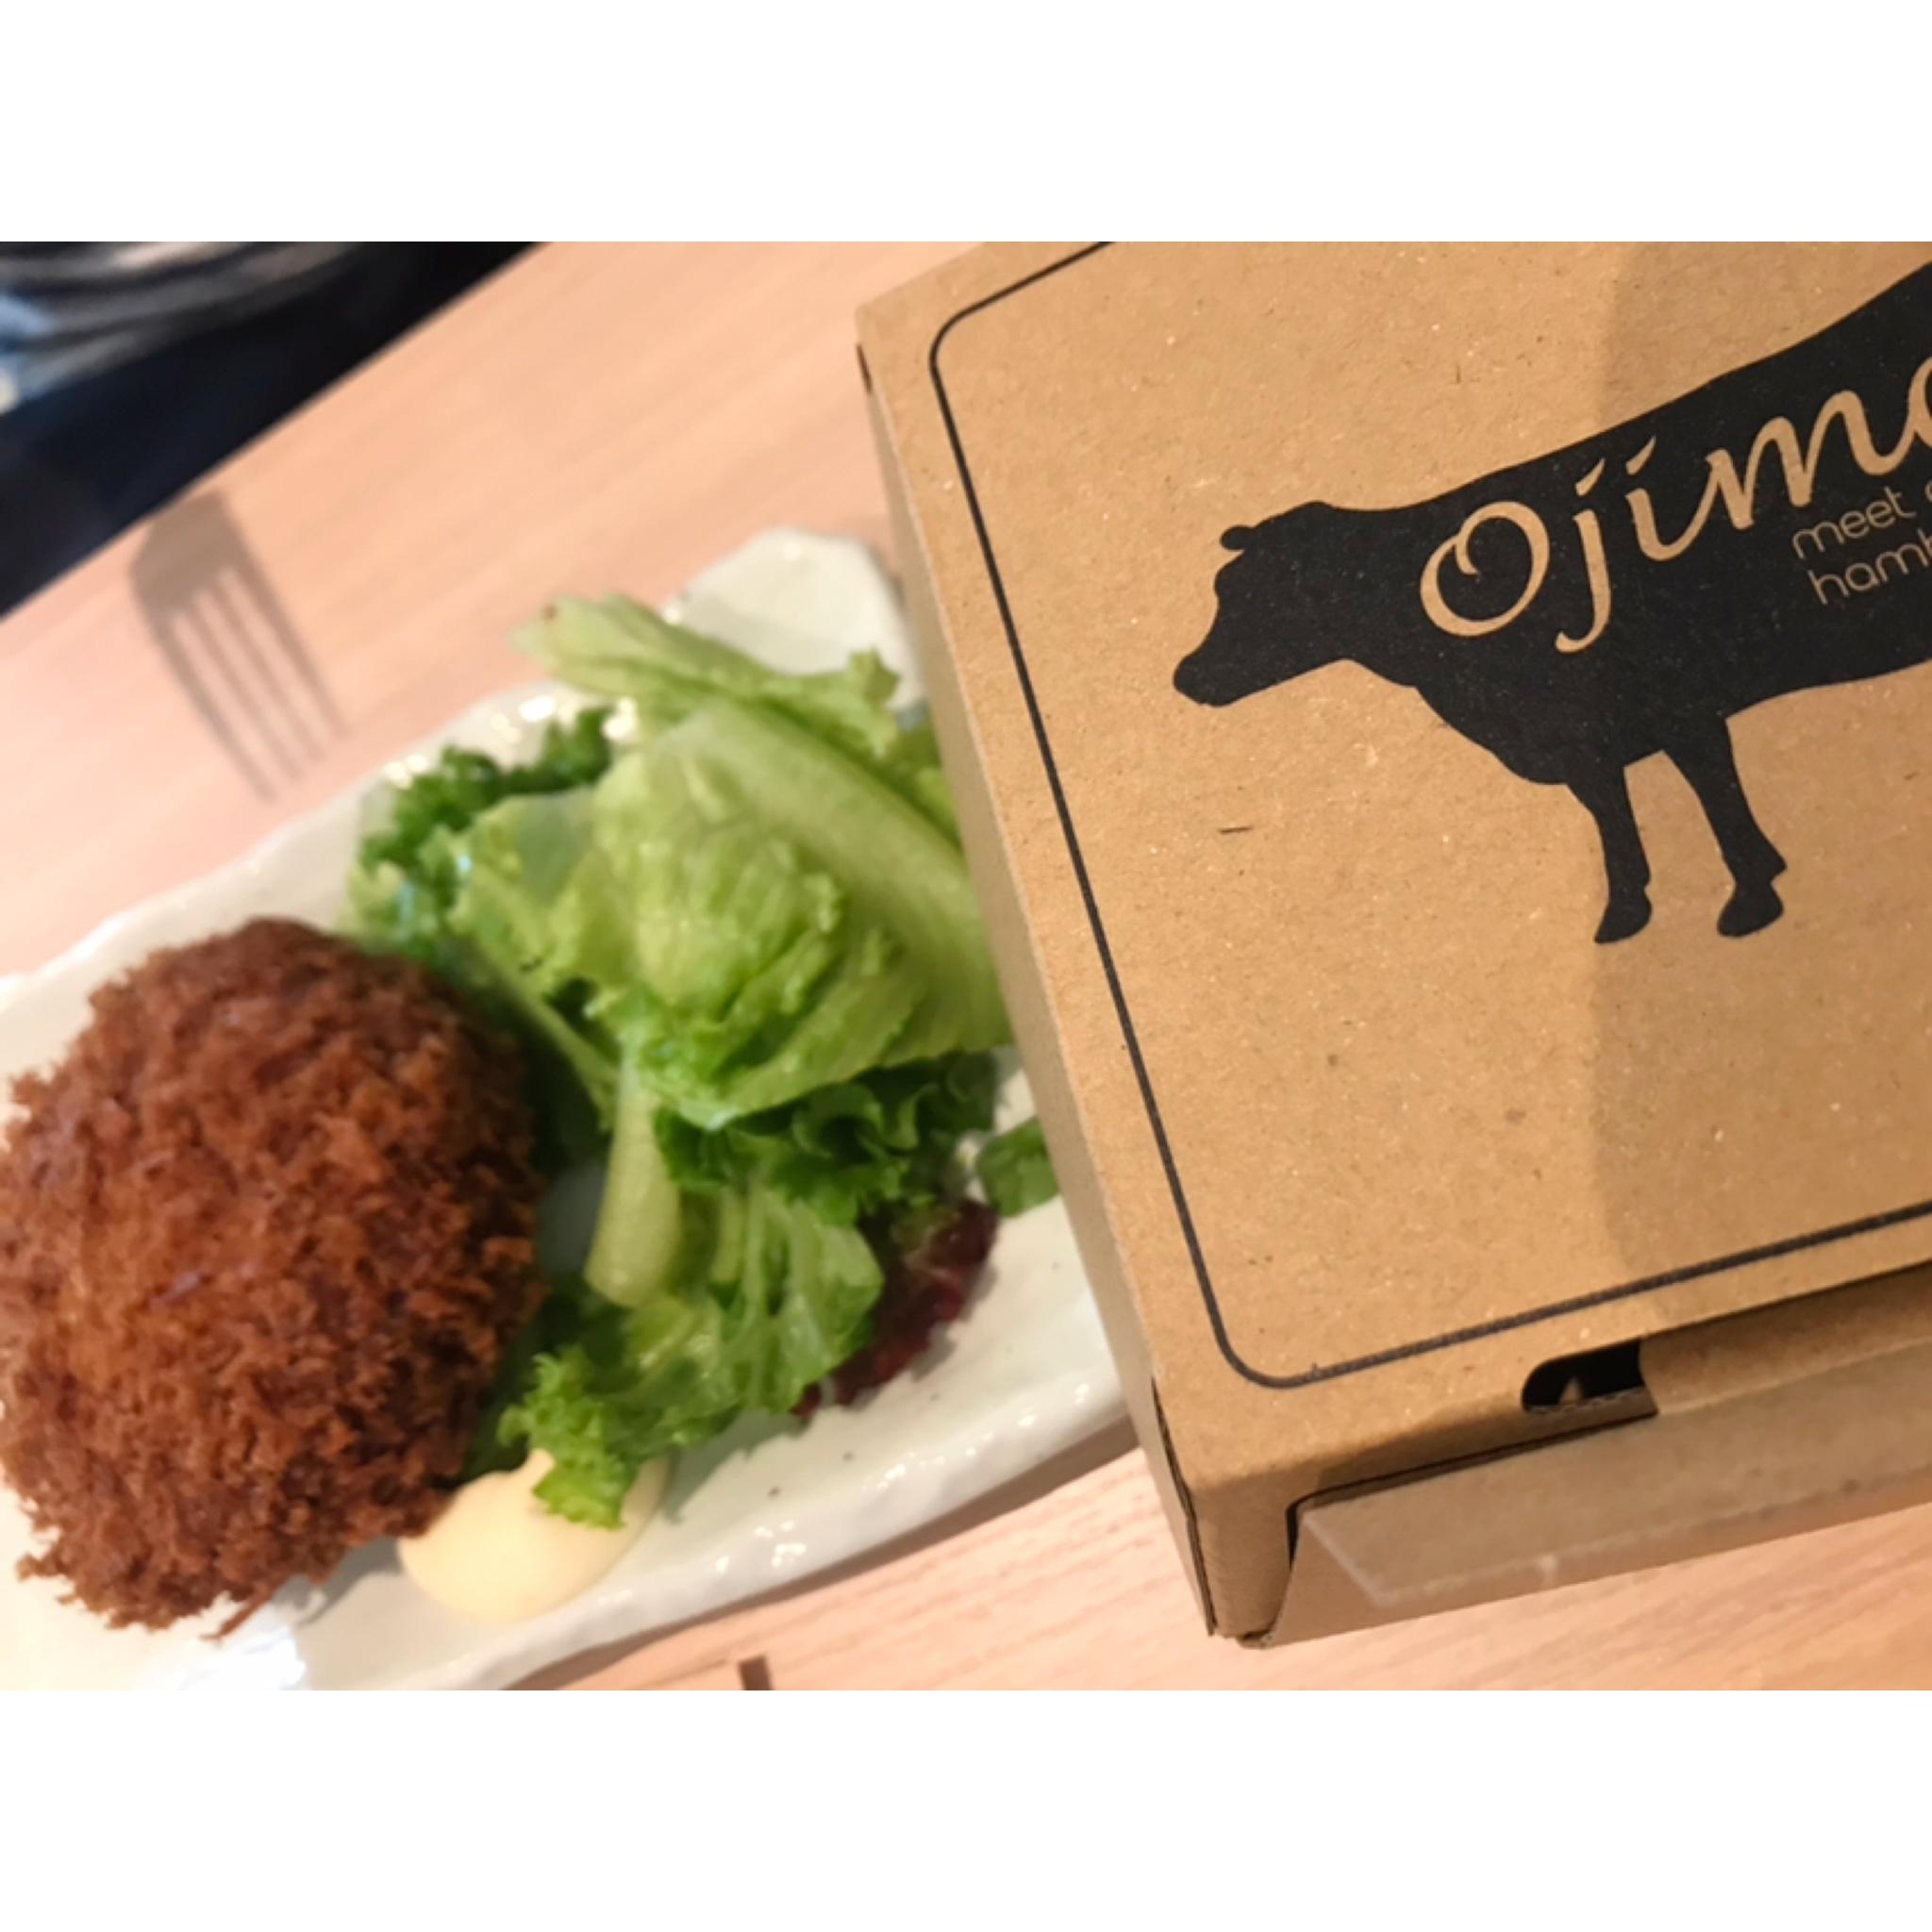 【MEAT CAFE ojima】美味しいお肉とビールならココ!老舗精肉店!横浜野毛カフェ!_3